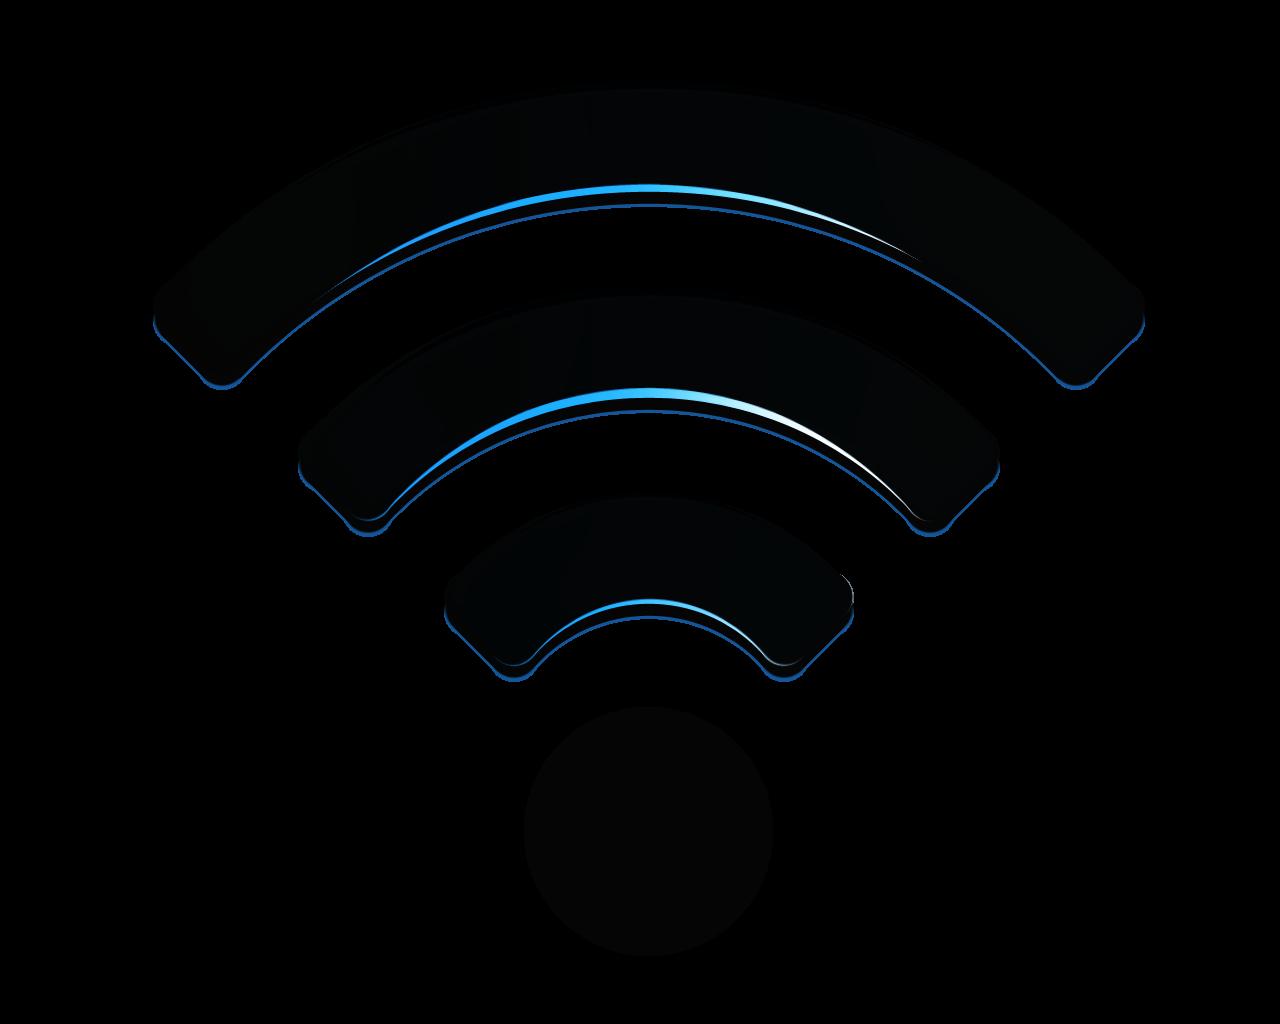 wifi logos rh logolynx com wifi logo font wife logos